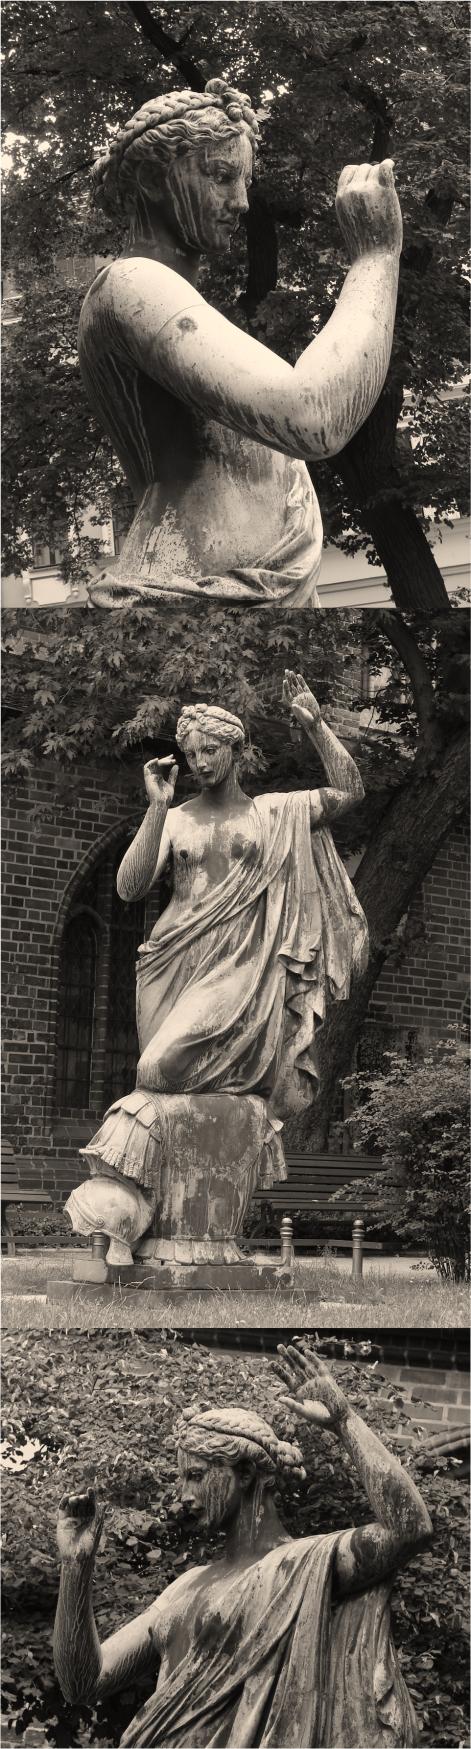 Statue Berlin 2011